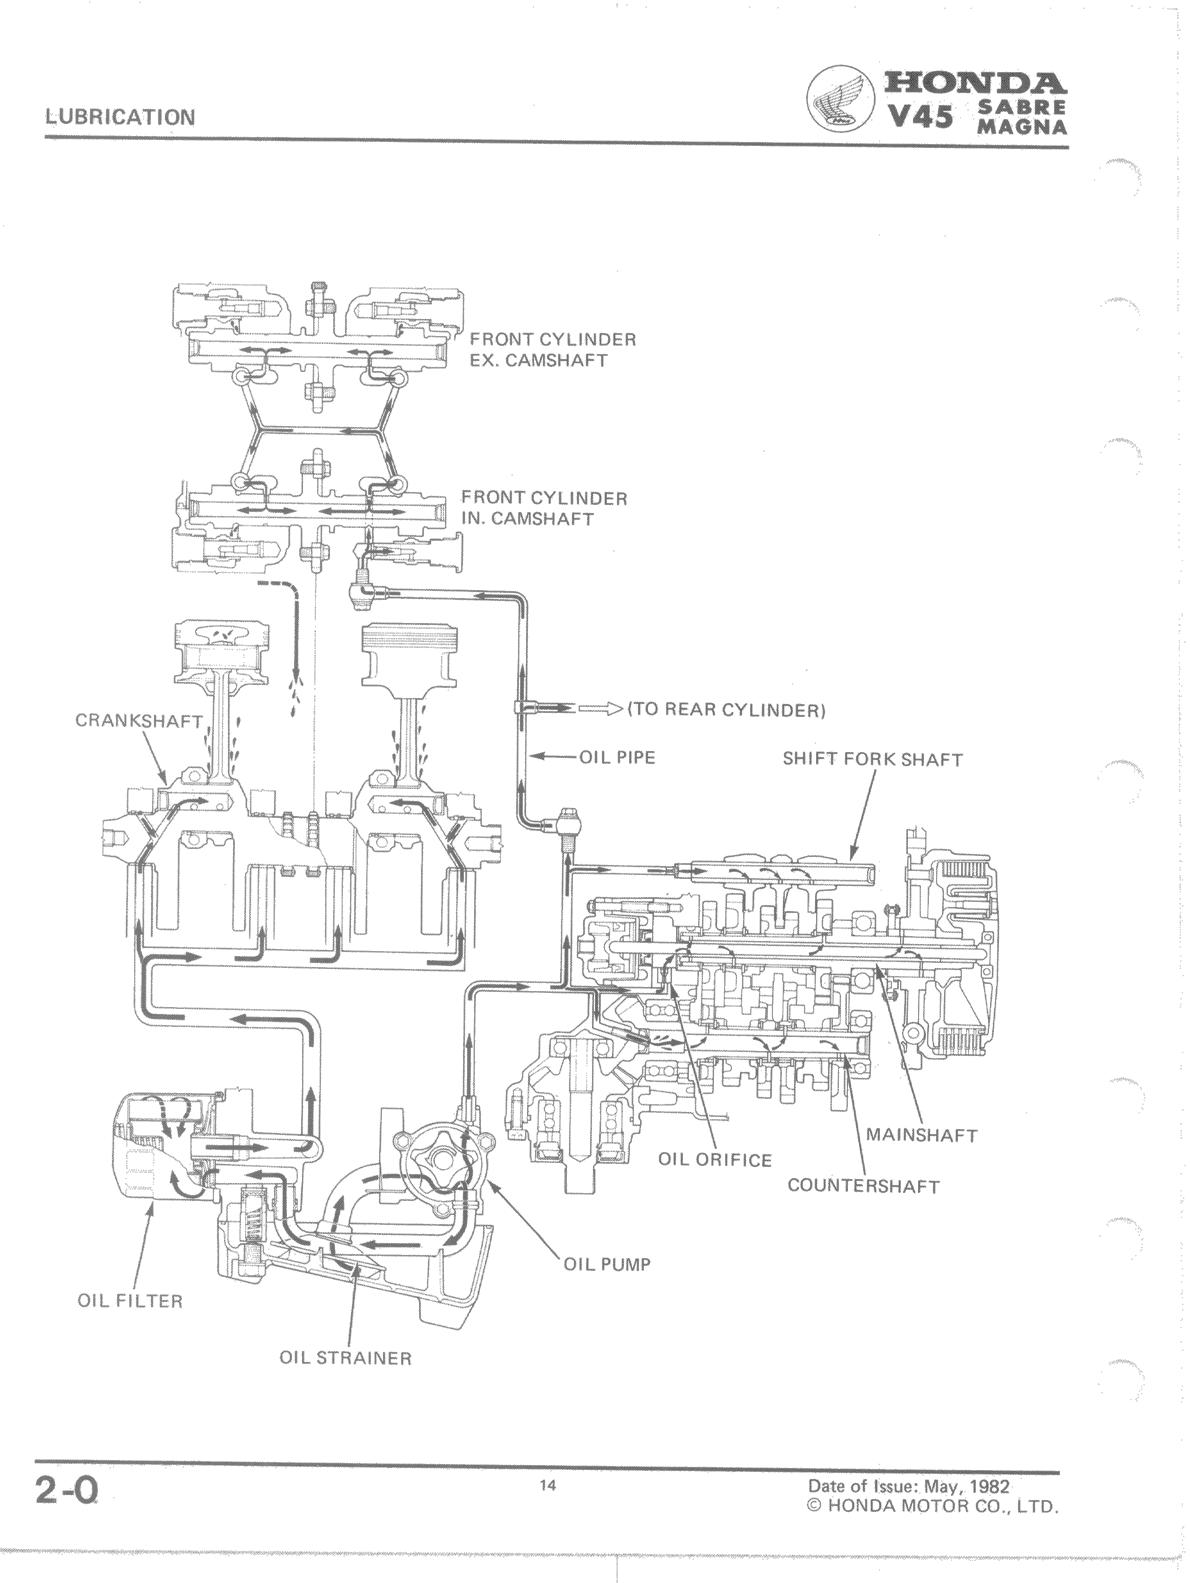 My Honda Cb360 Wiring Diagram Wiring Diagram